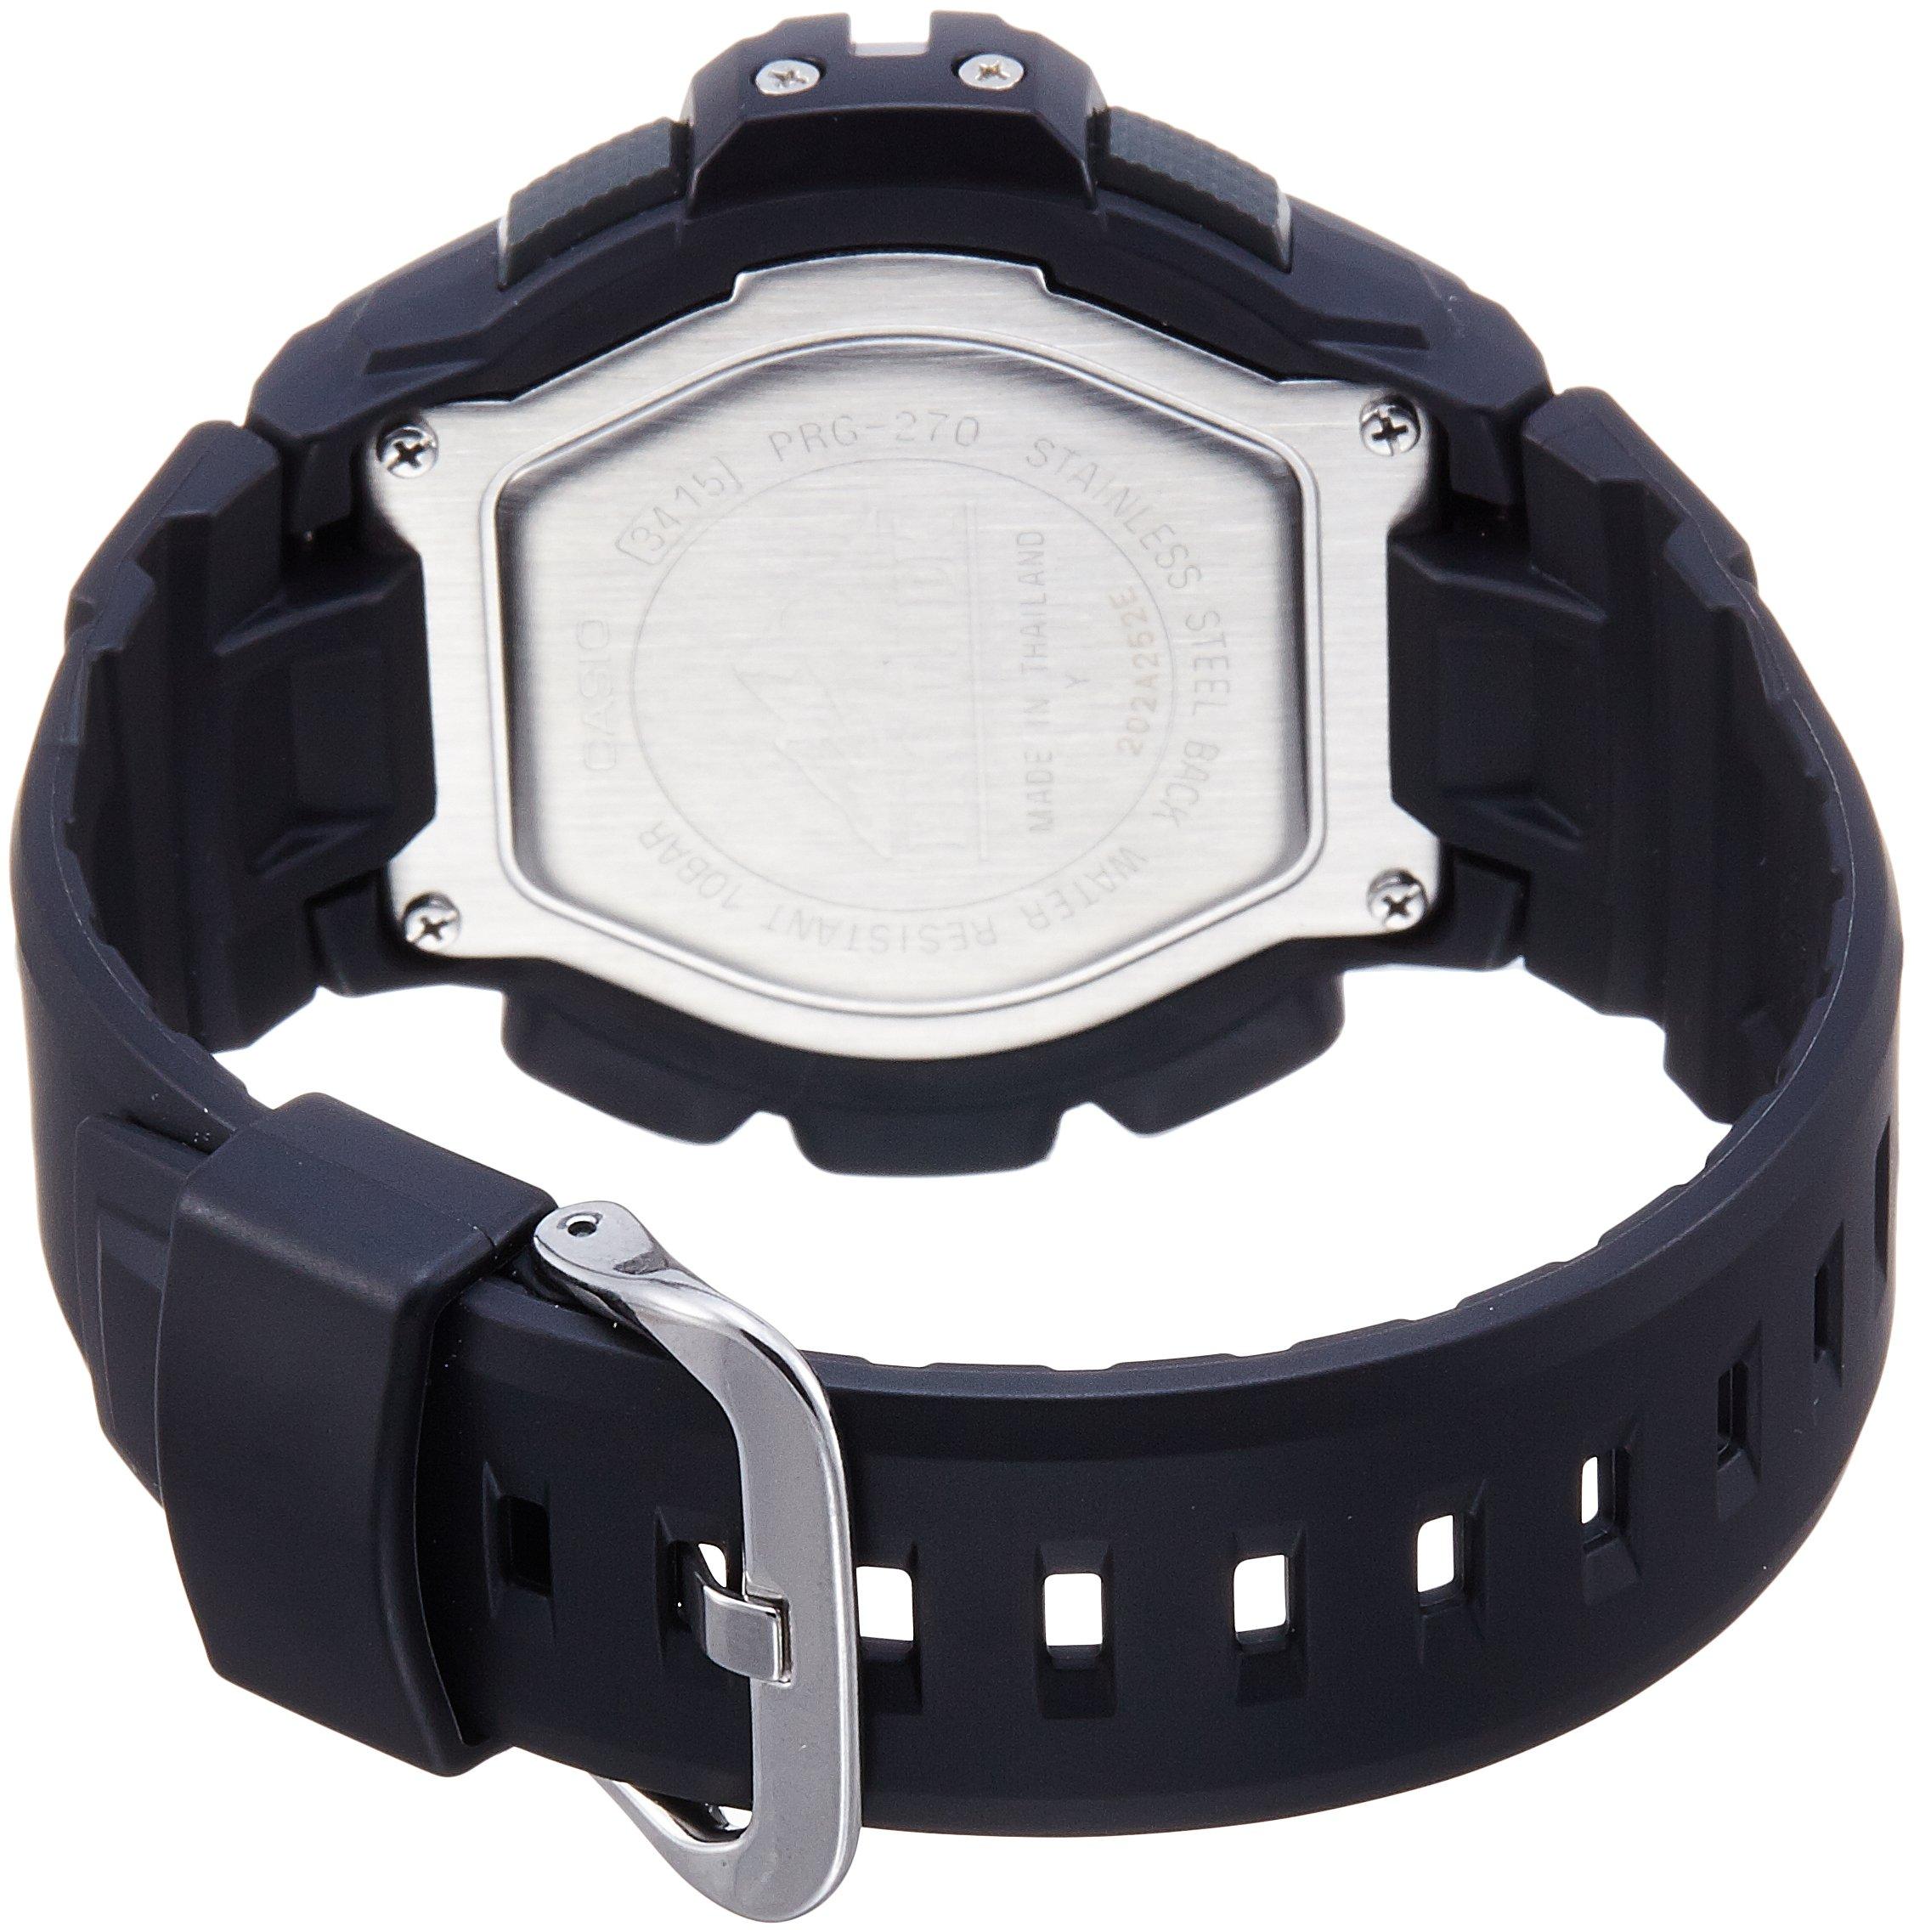 Casio Men's Pro Trek PRG-270-1 Tough Solar Triple Sensor Multifunction Digital Sport Watch by Casio (Image #2)